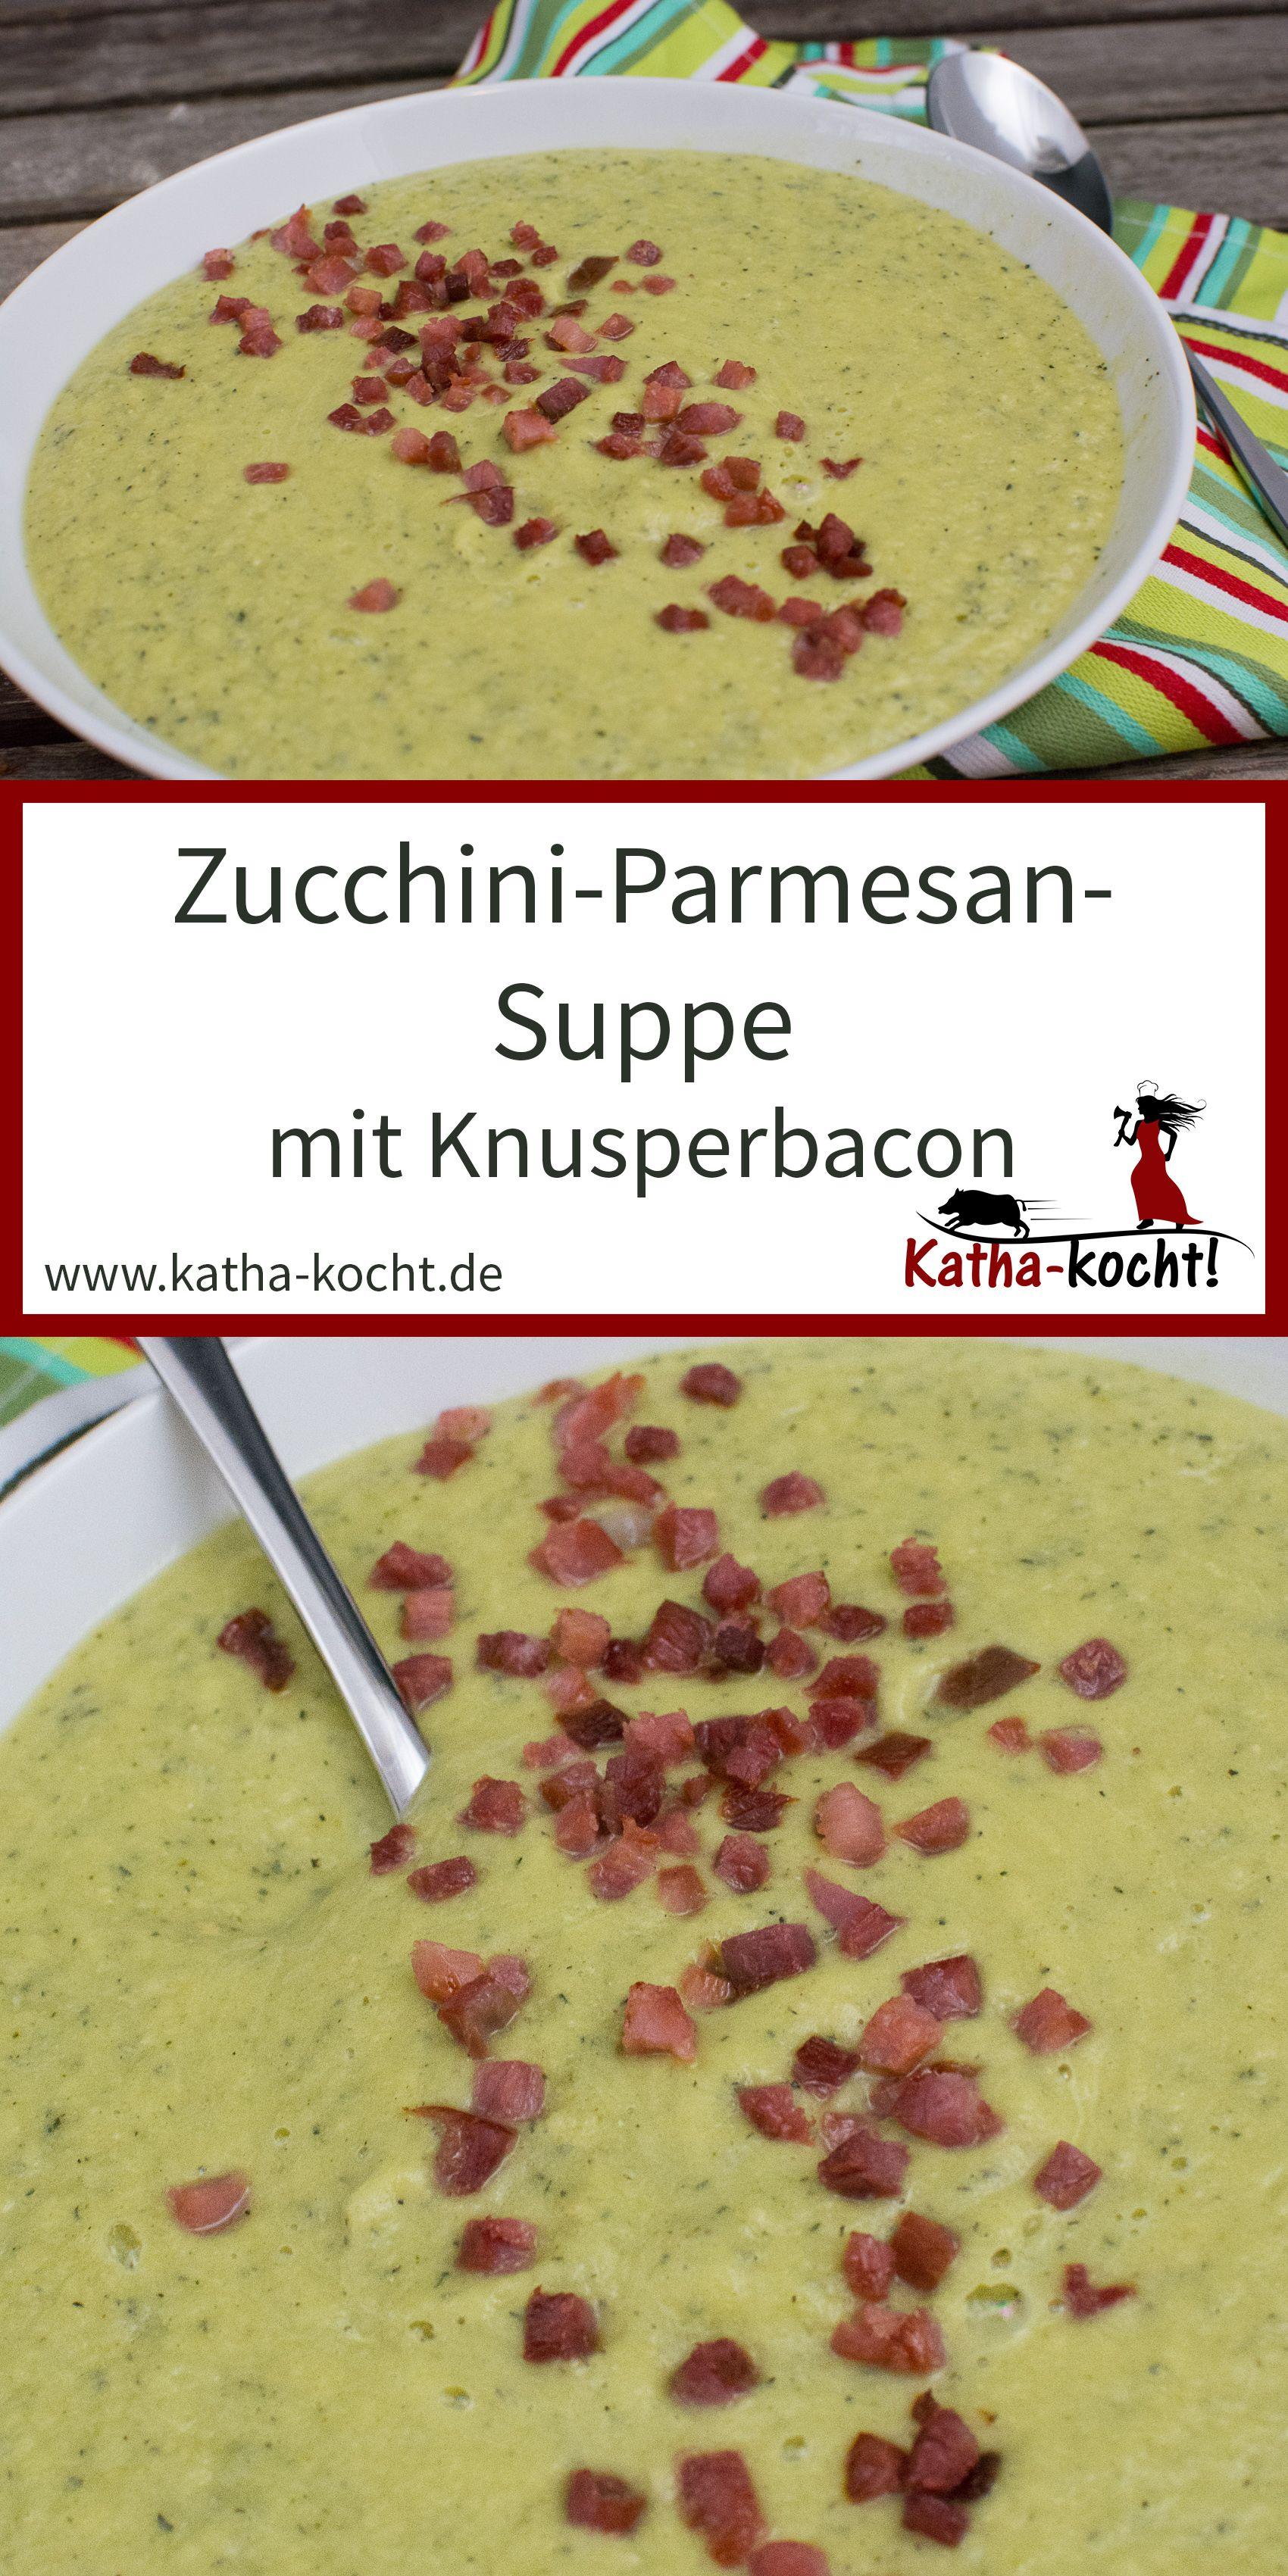 Photo of Zucchini-Parmesan Suppe